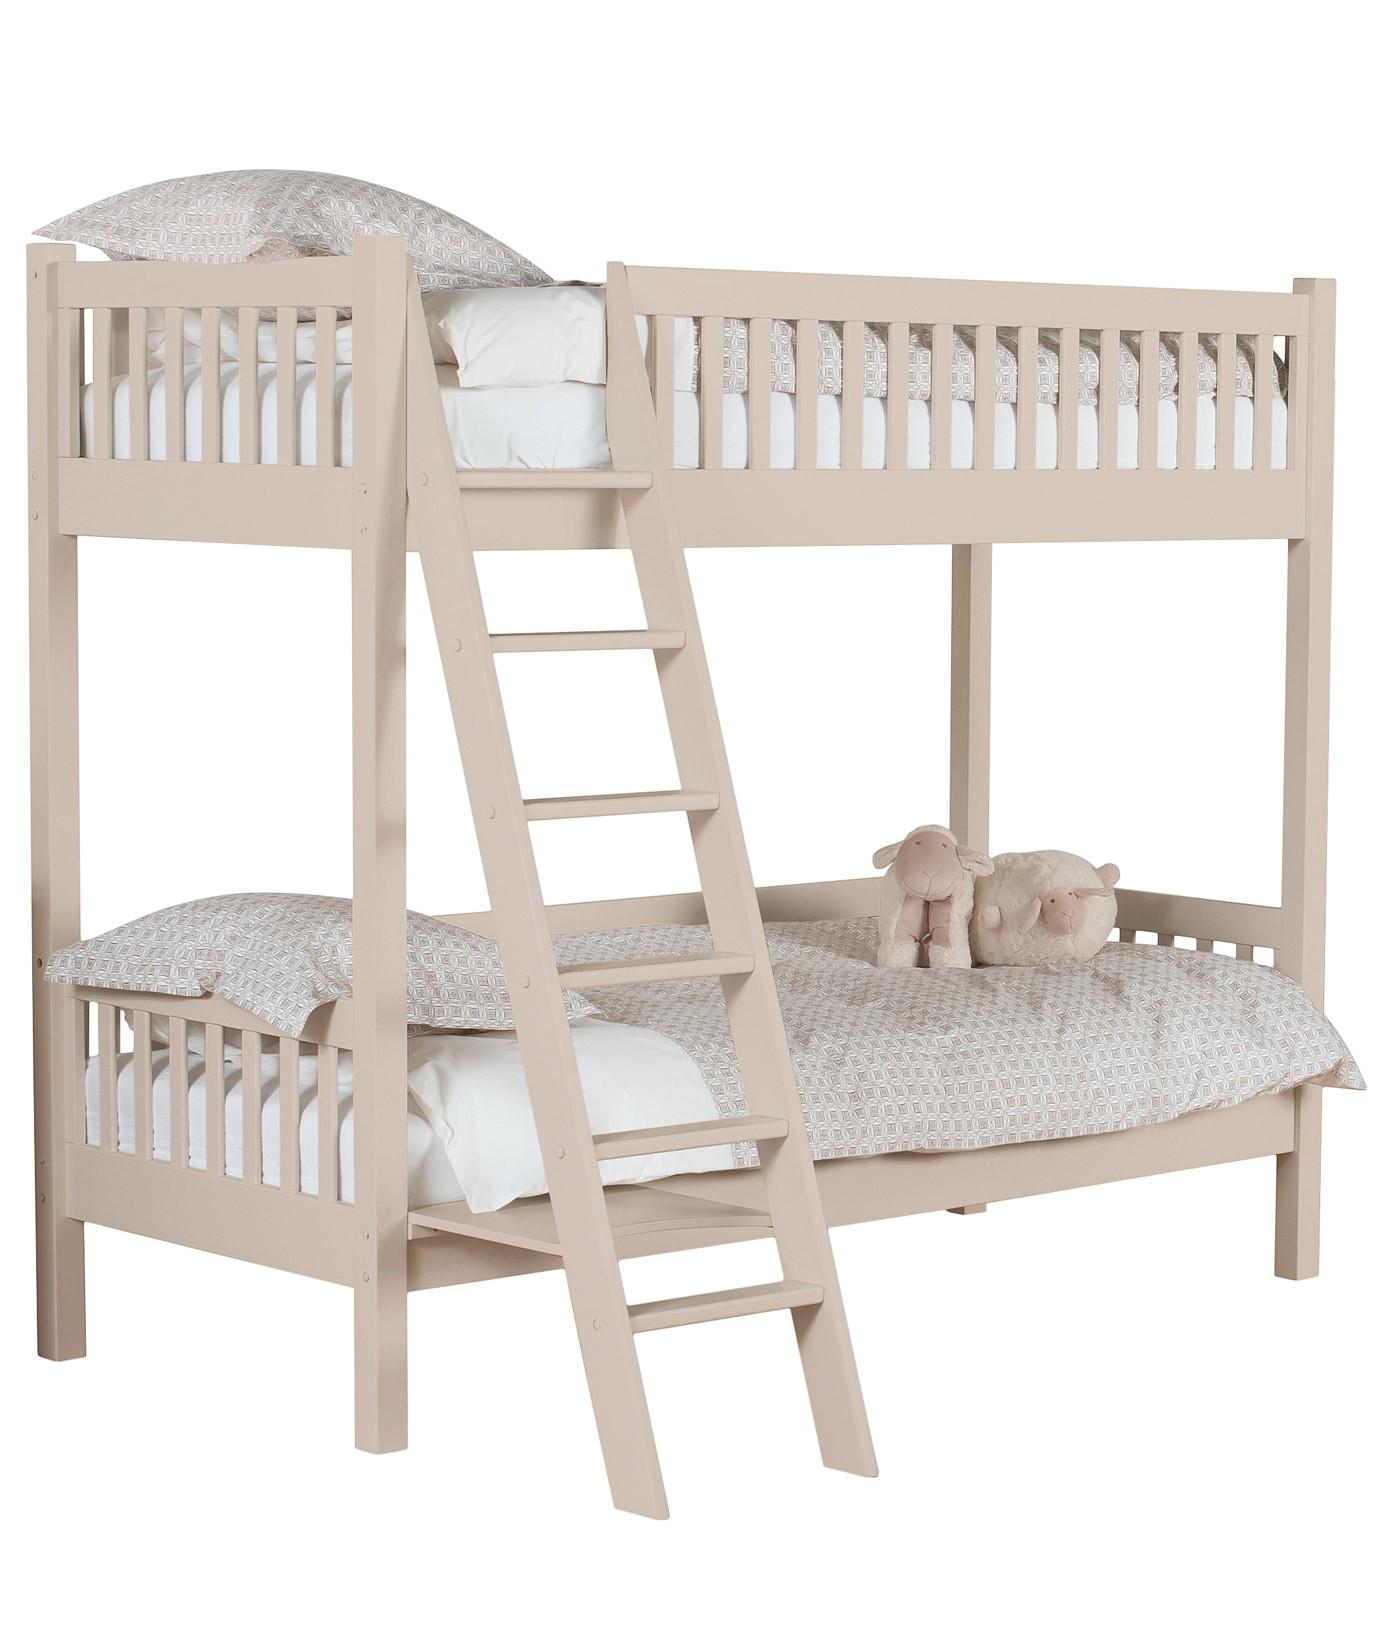 lits superpos s joy. Black Bedroom Furniture Sets. Home Design Ideas